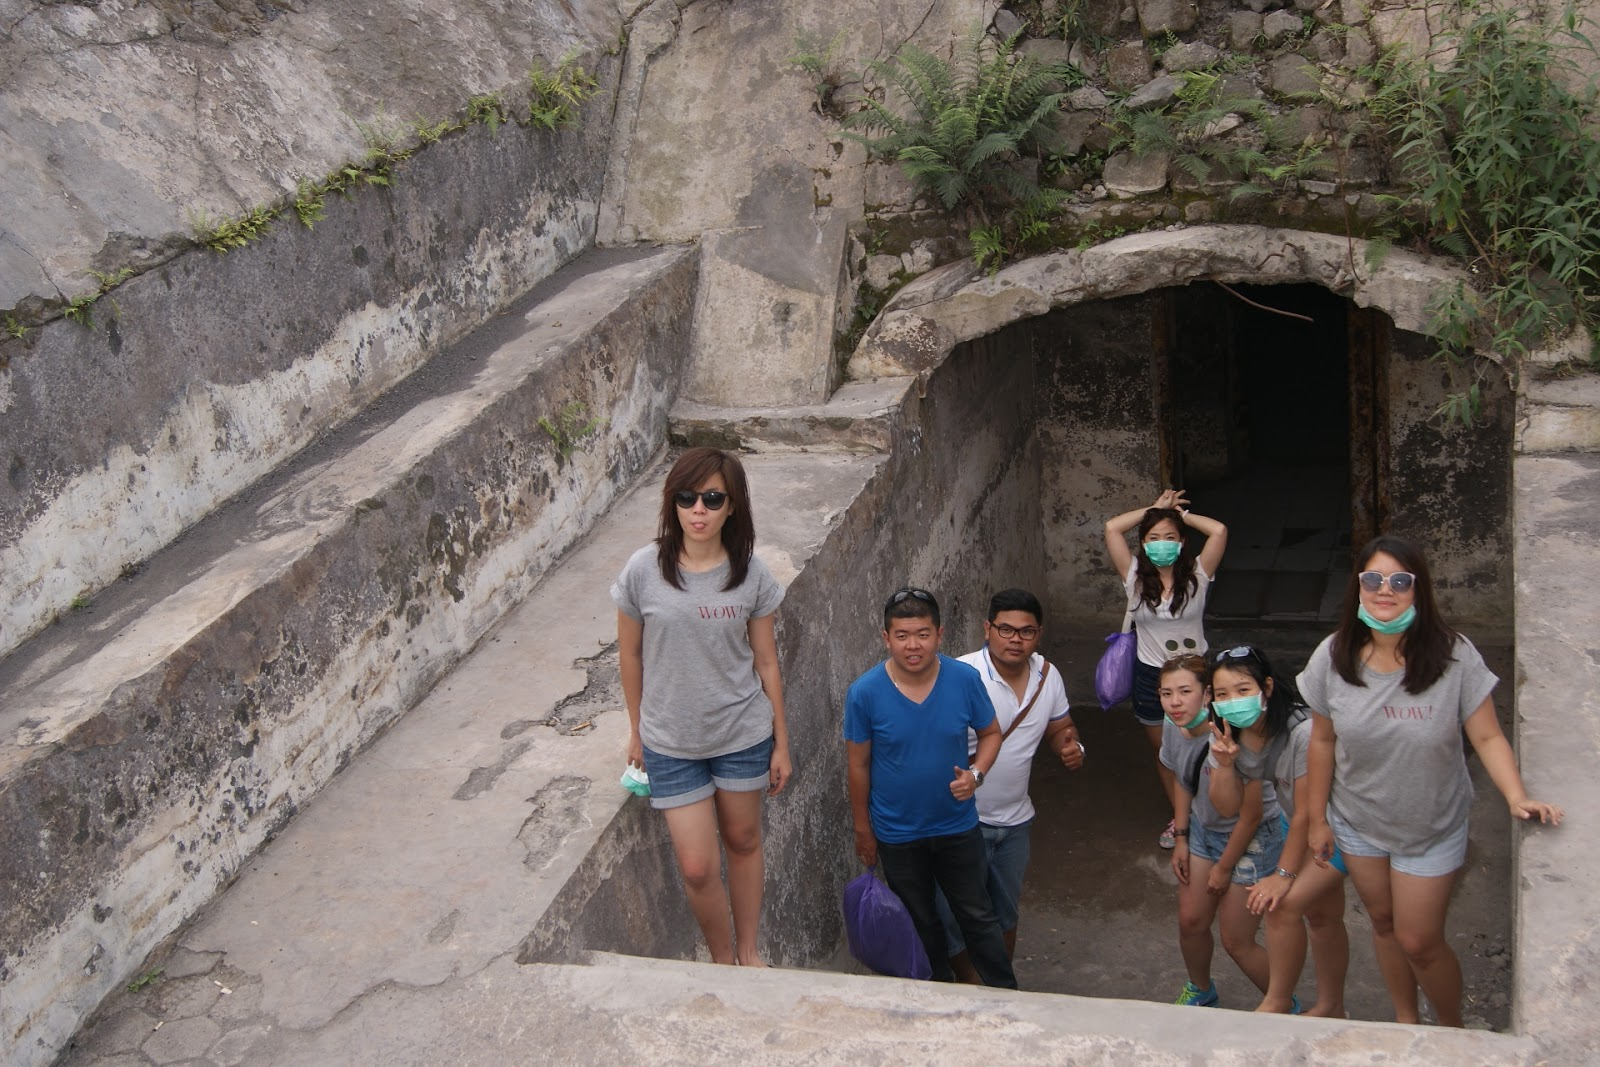 Wisata Bunker Kaliadem Merapi Jogja Kaliurang Harga Tiket Masuk Lava